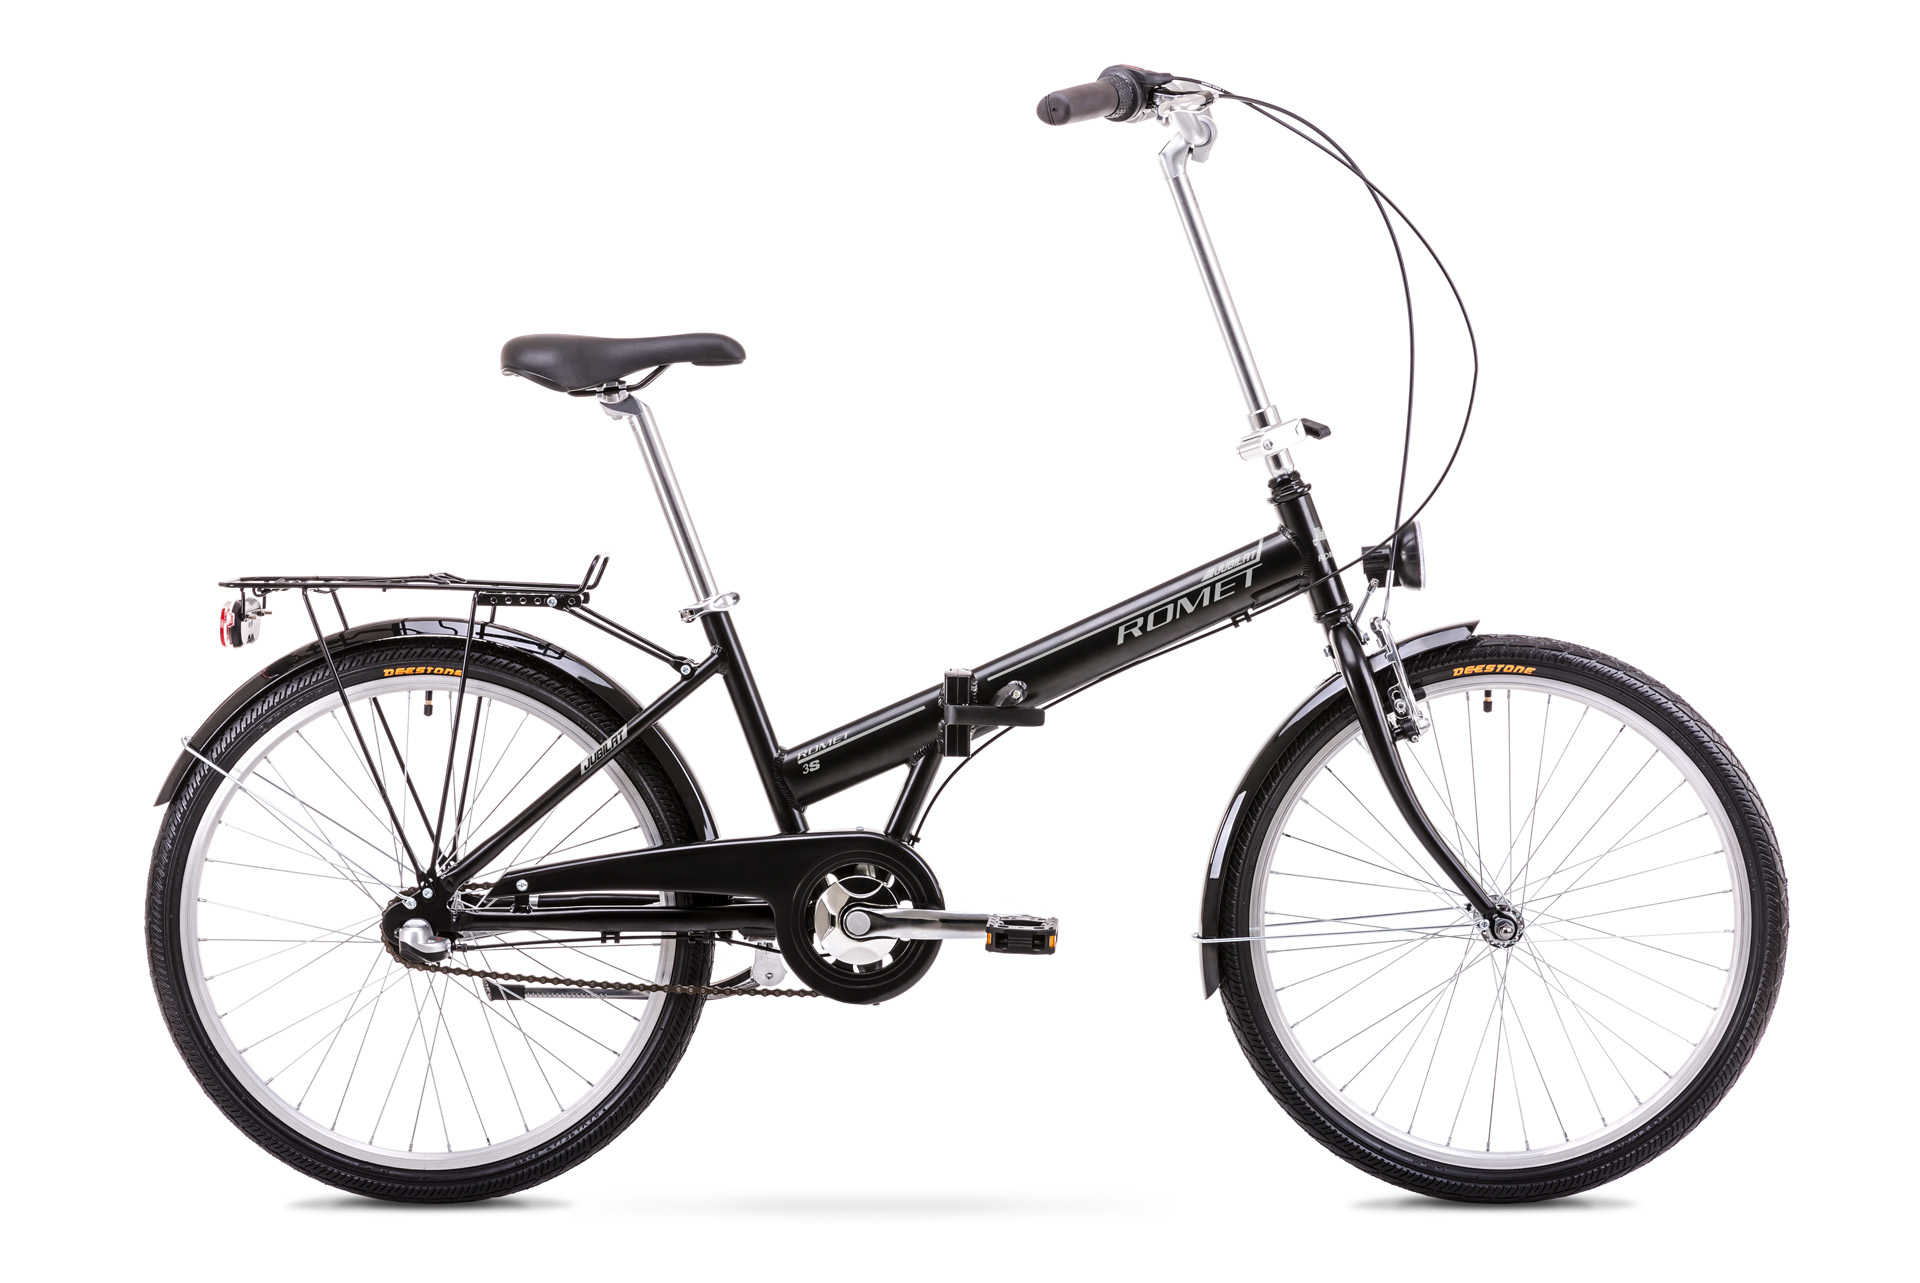 Bicicleta pliabila Unisex Romet Jubilat 3 Negru/Gri 2019 imagine